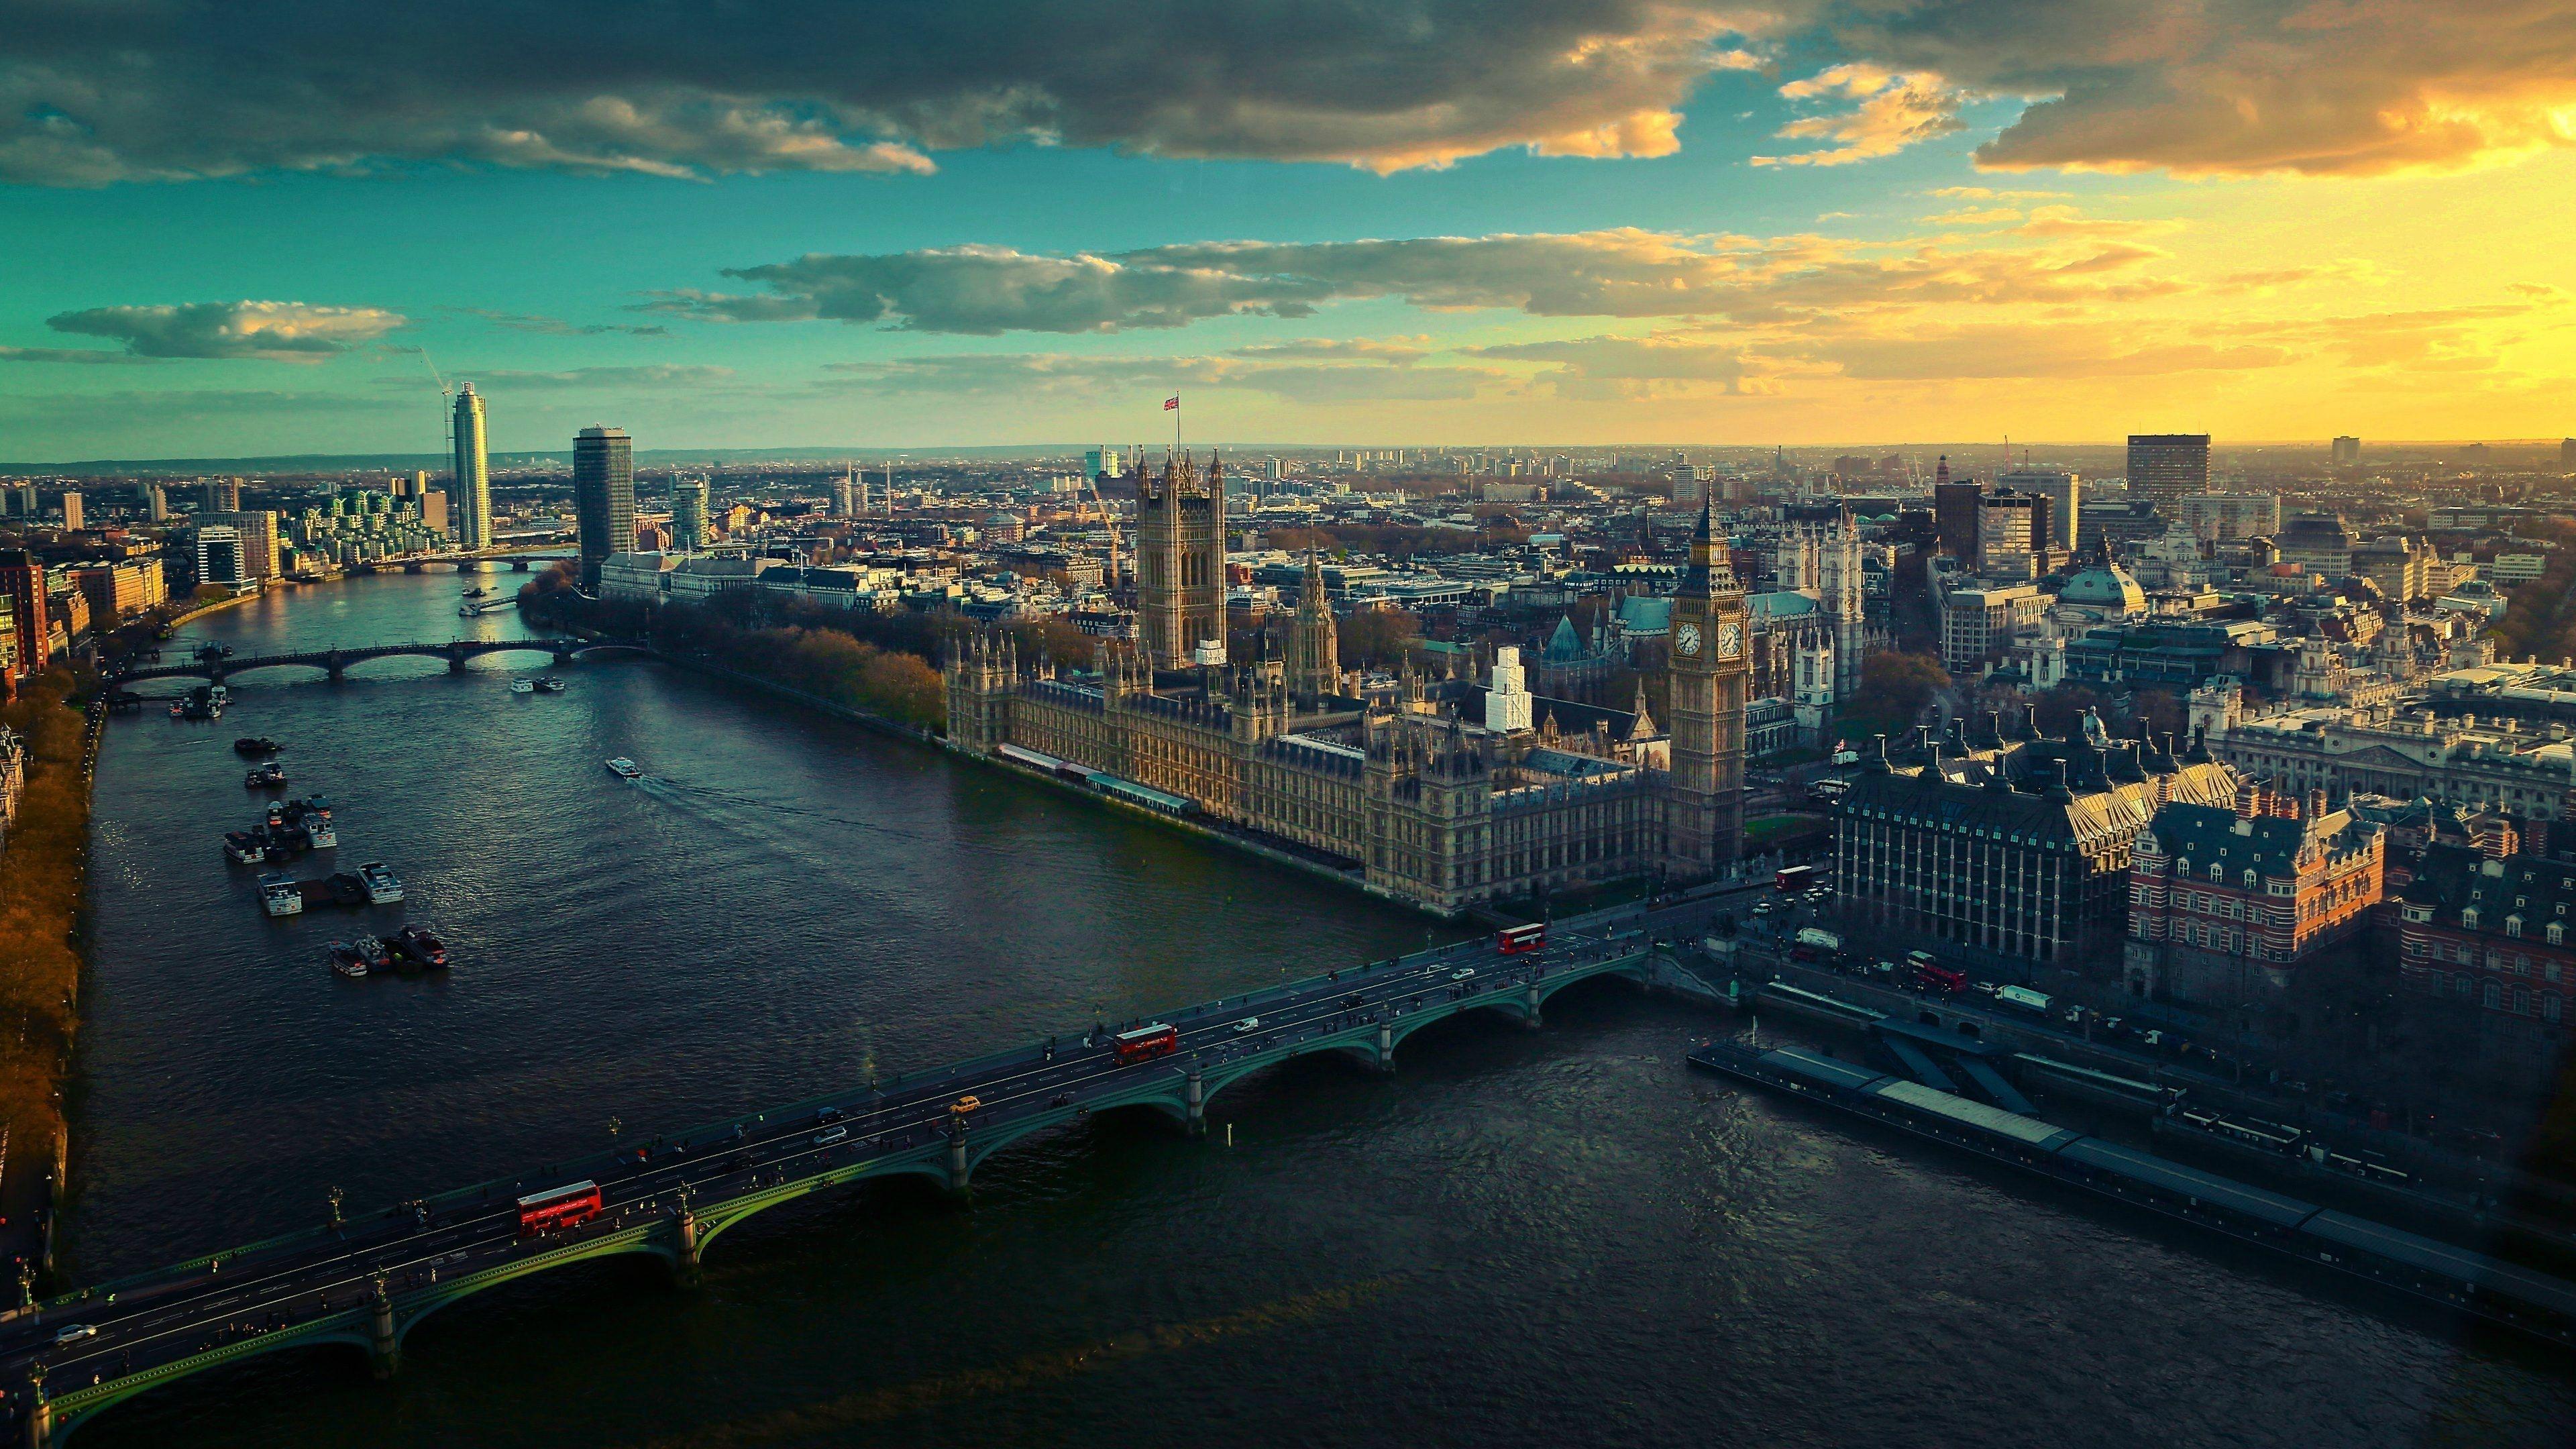 London 4k Wallpapers Top Free London 4k Backgrounds